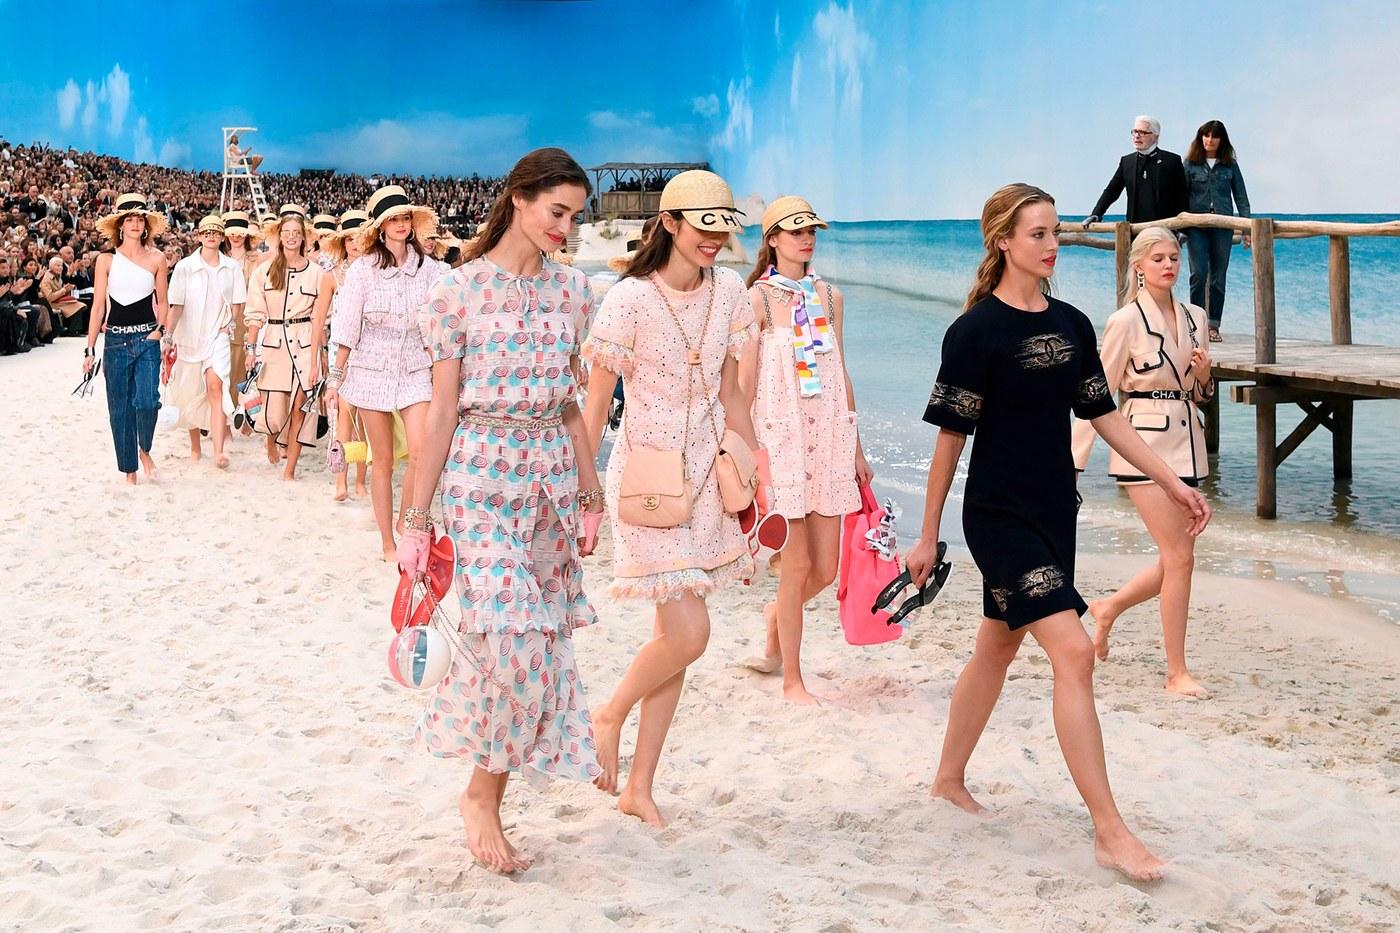 032-Karl-Lagerfeld alla sfilata Chanel Primavera Estate 2019 al Grand Palais, Parigi